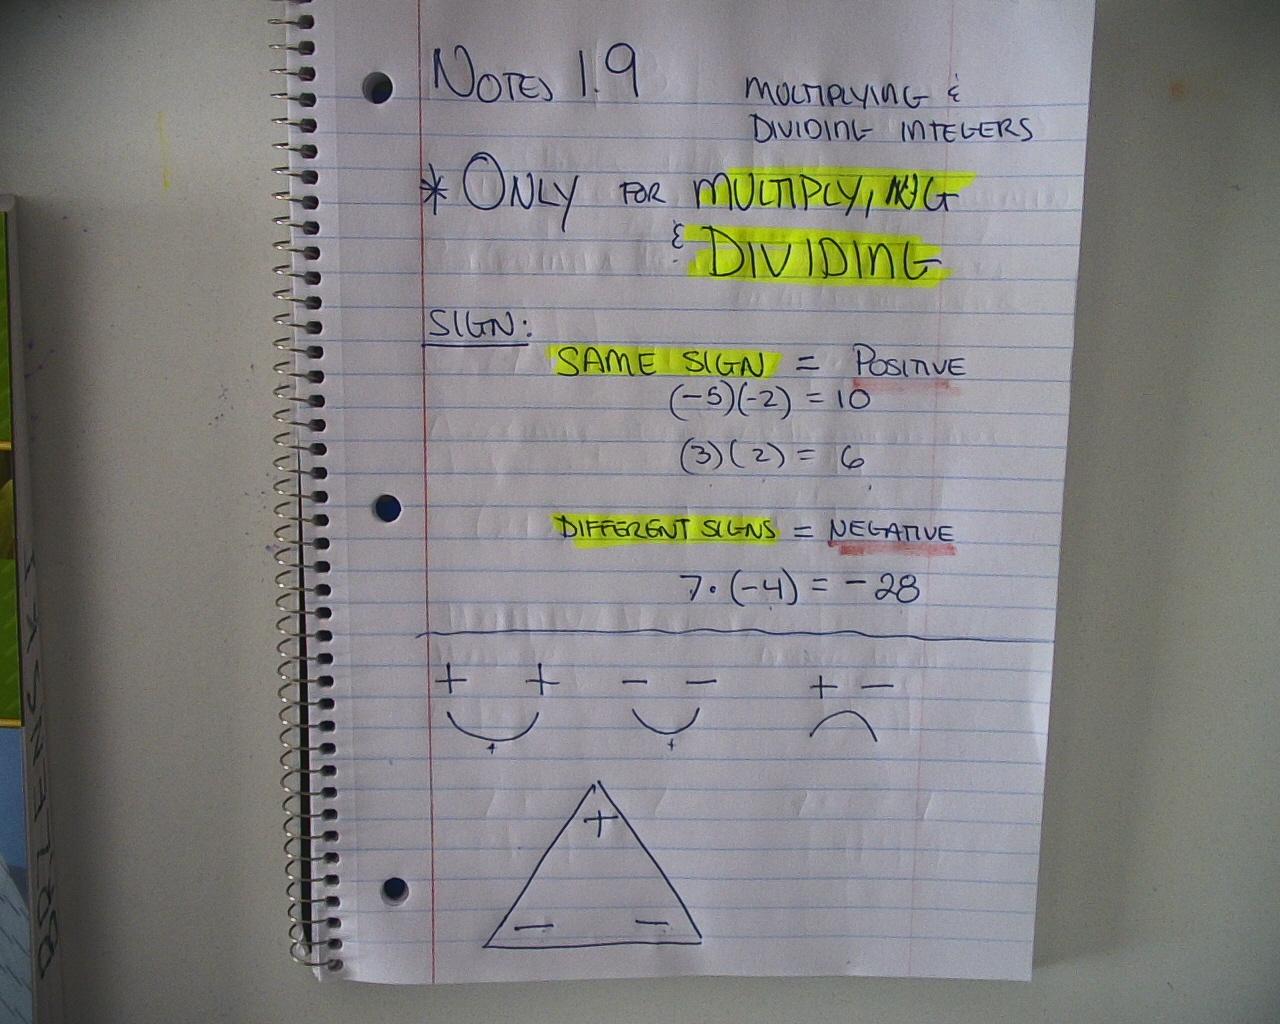 Mr Brzenski S Math Class Notes 1 9 Prealgebra Notes 2 1